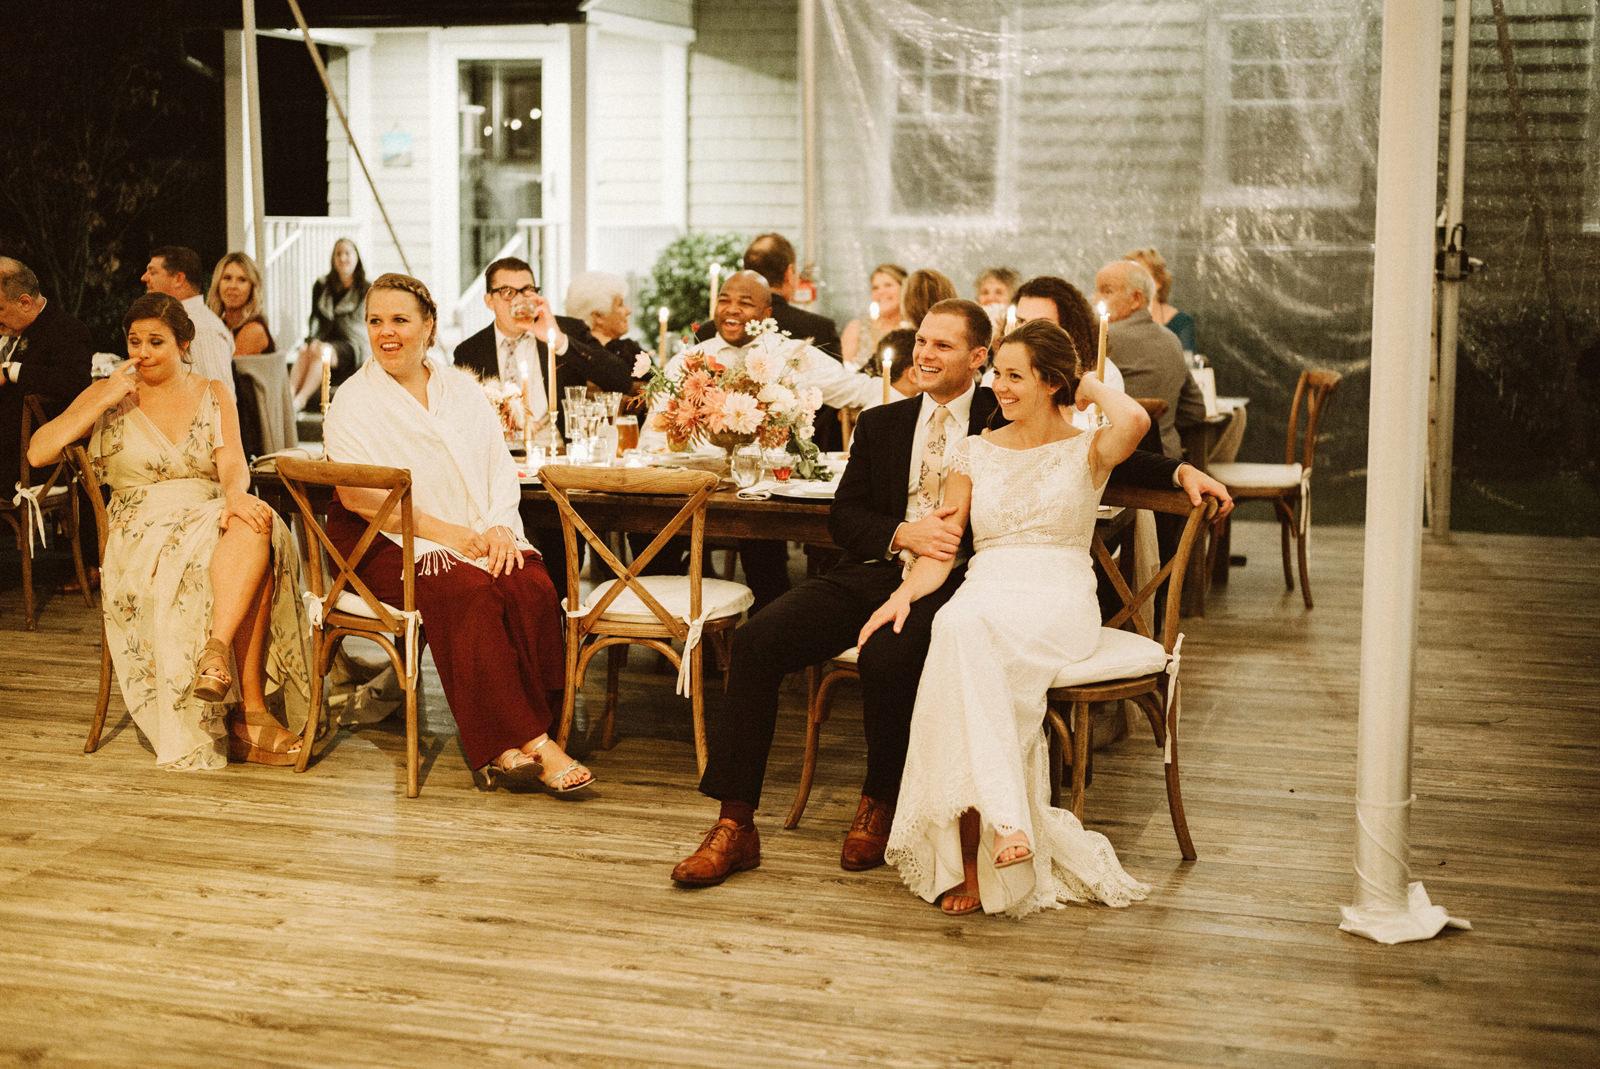 bridgeport-wedding-151 BRIDGEPORT, CONNECTICUT BACKYARD WEDDING